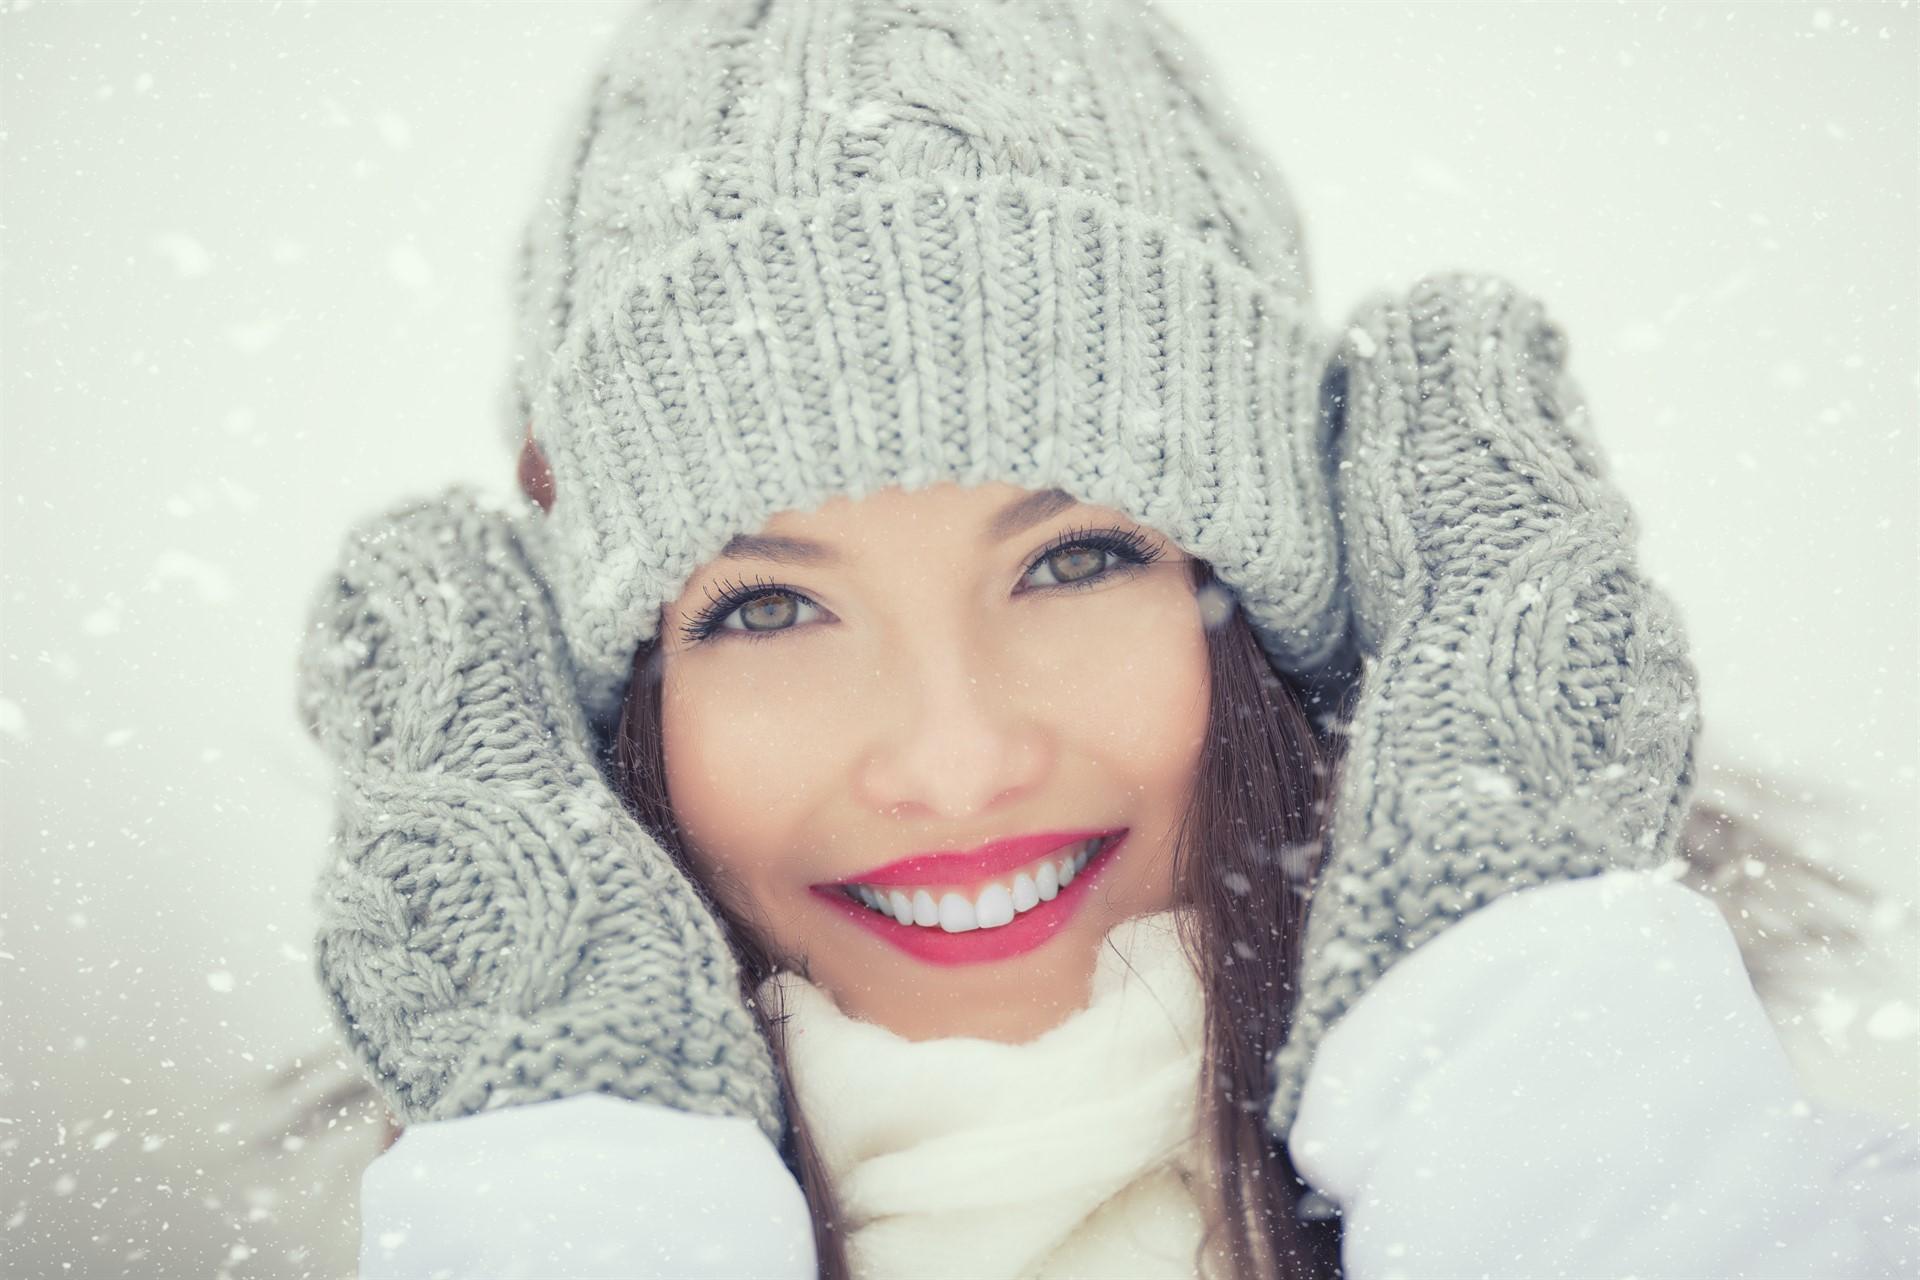 Winter is the best time for skin rejuvenation